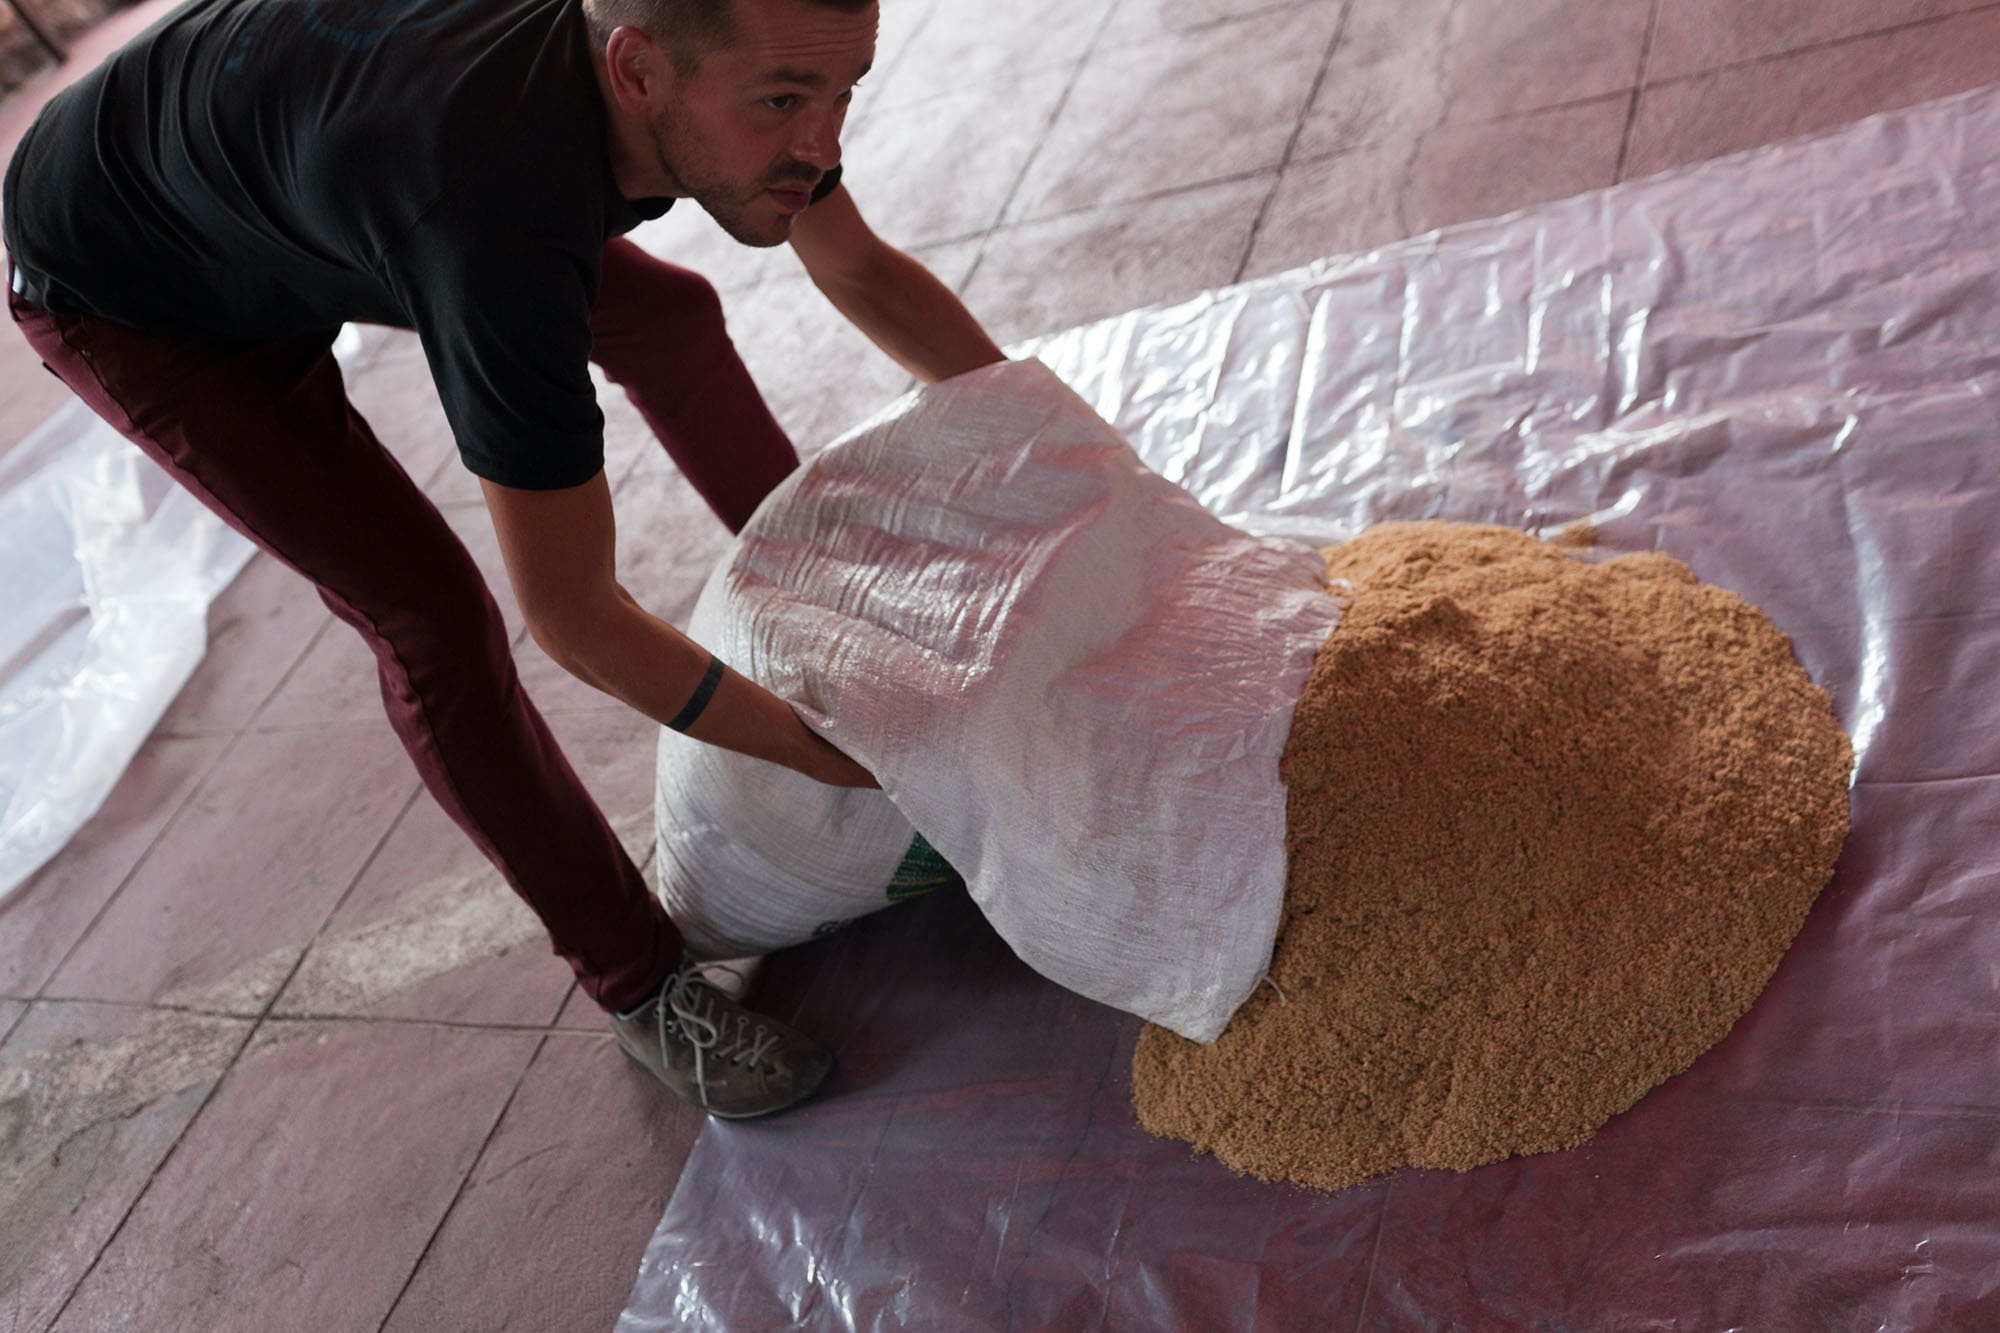 Dying sawdust to make an alfombra for Semana Santa in Antigua, Guatemala.